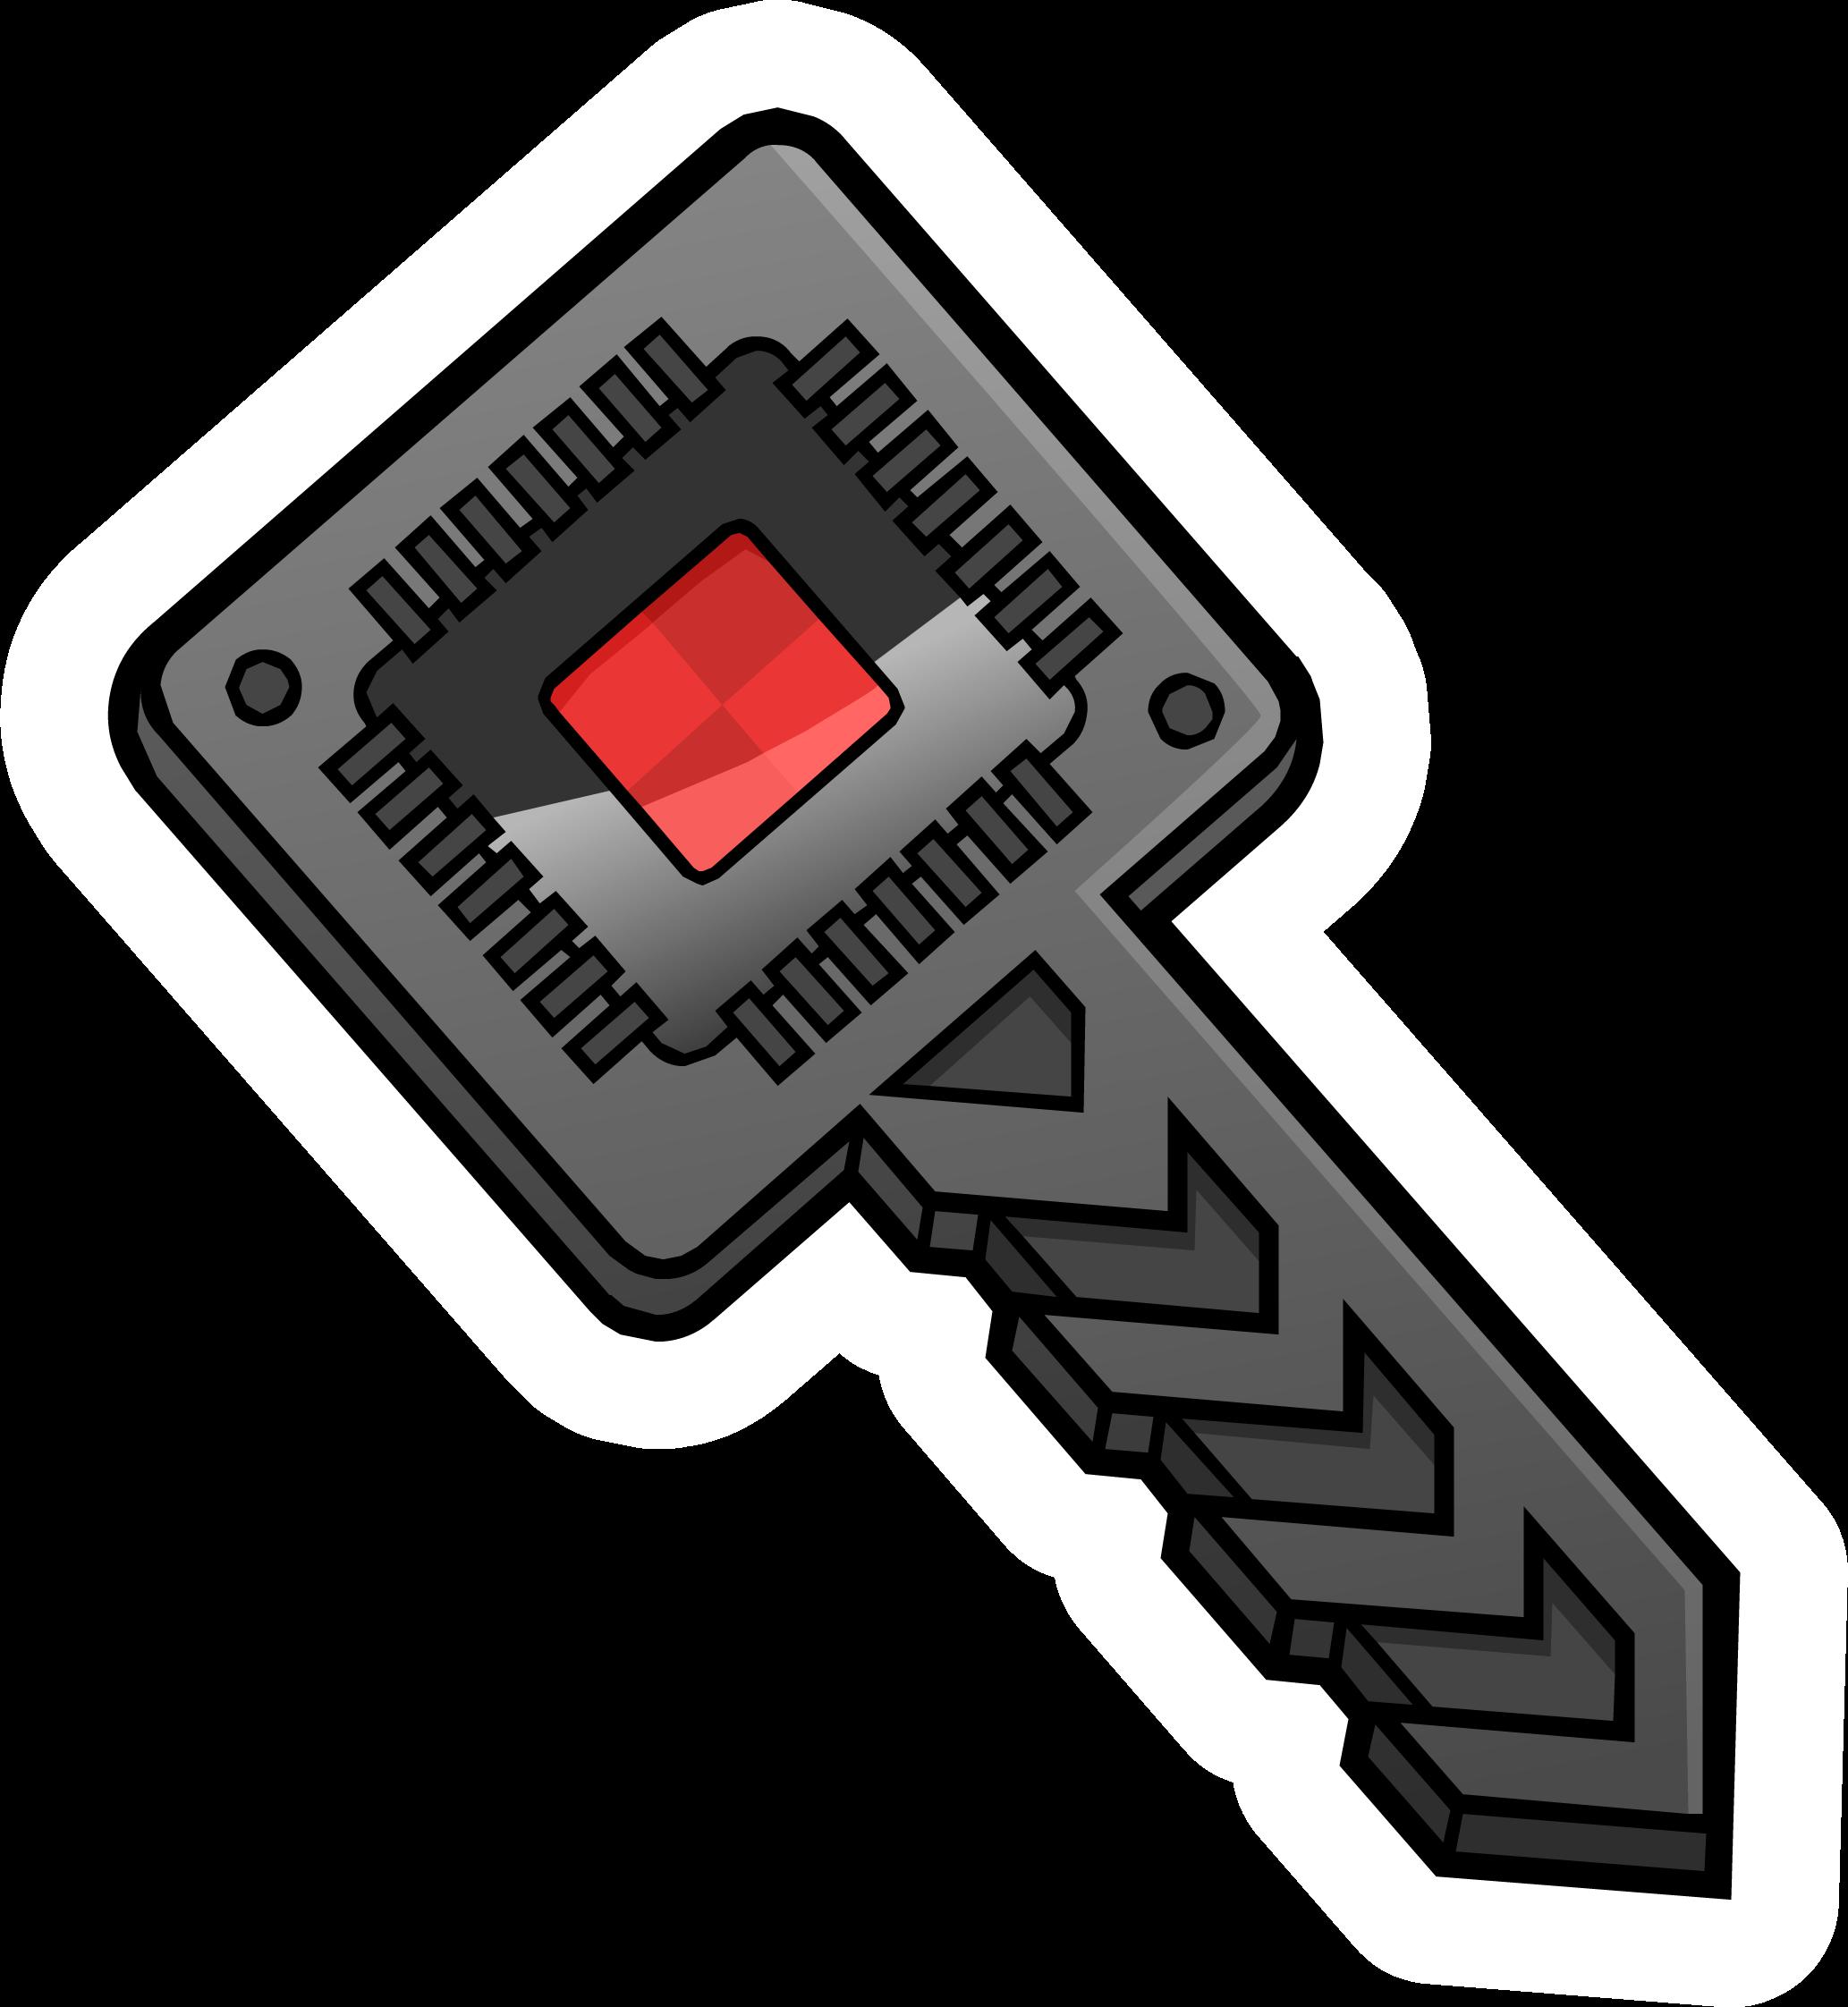 Expedition Key Pin